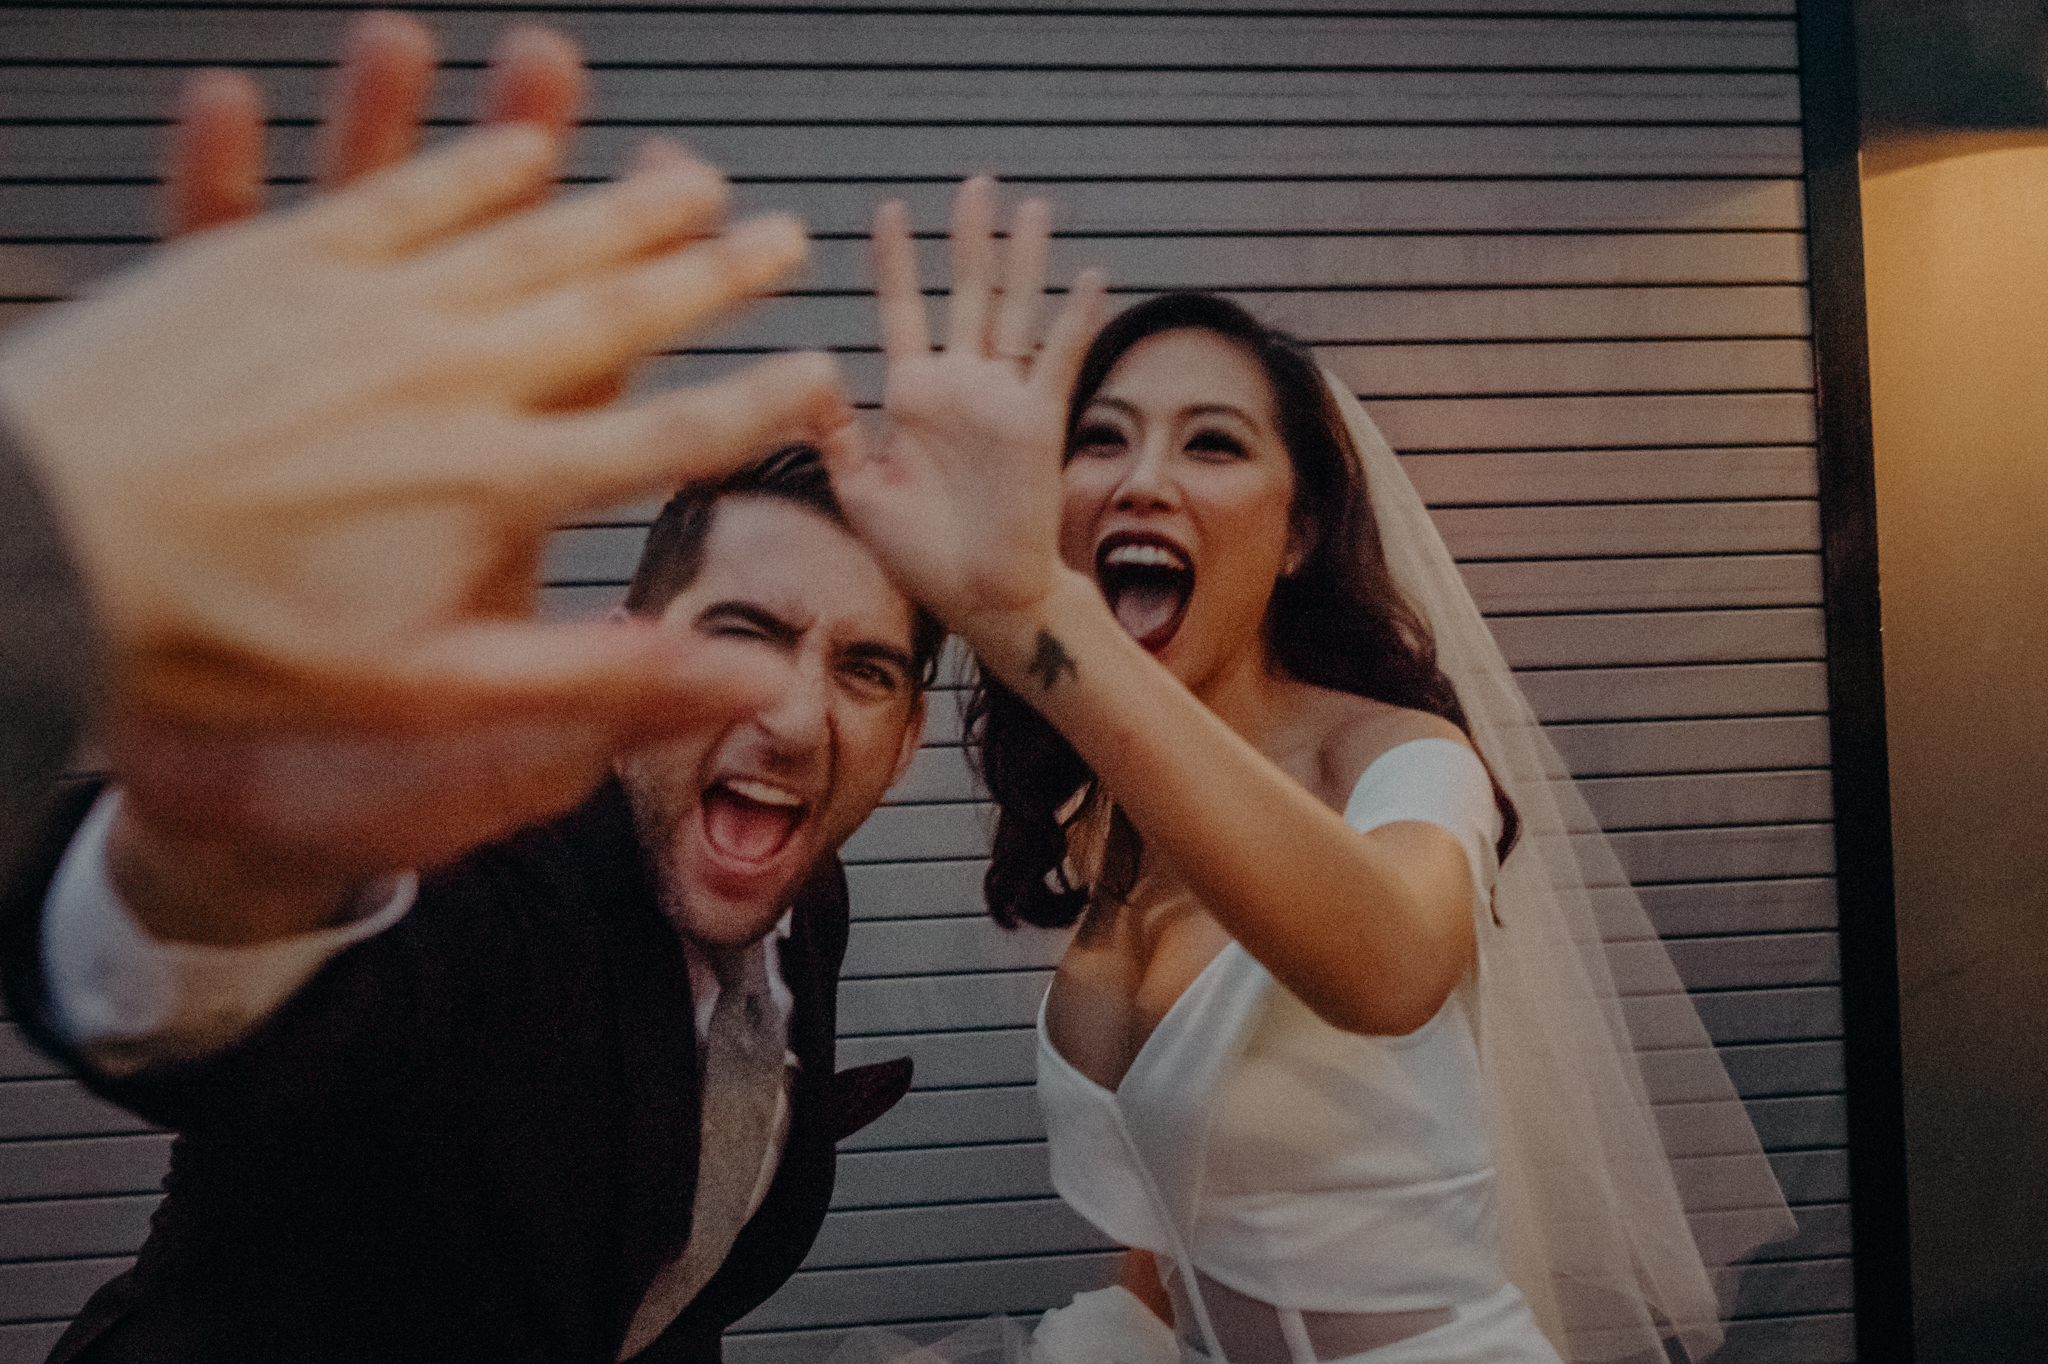 los angeles wedding photographer - wedding photographer in long beach - LGBTQ wedding photographer - isaiahandtaylor.com